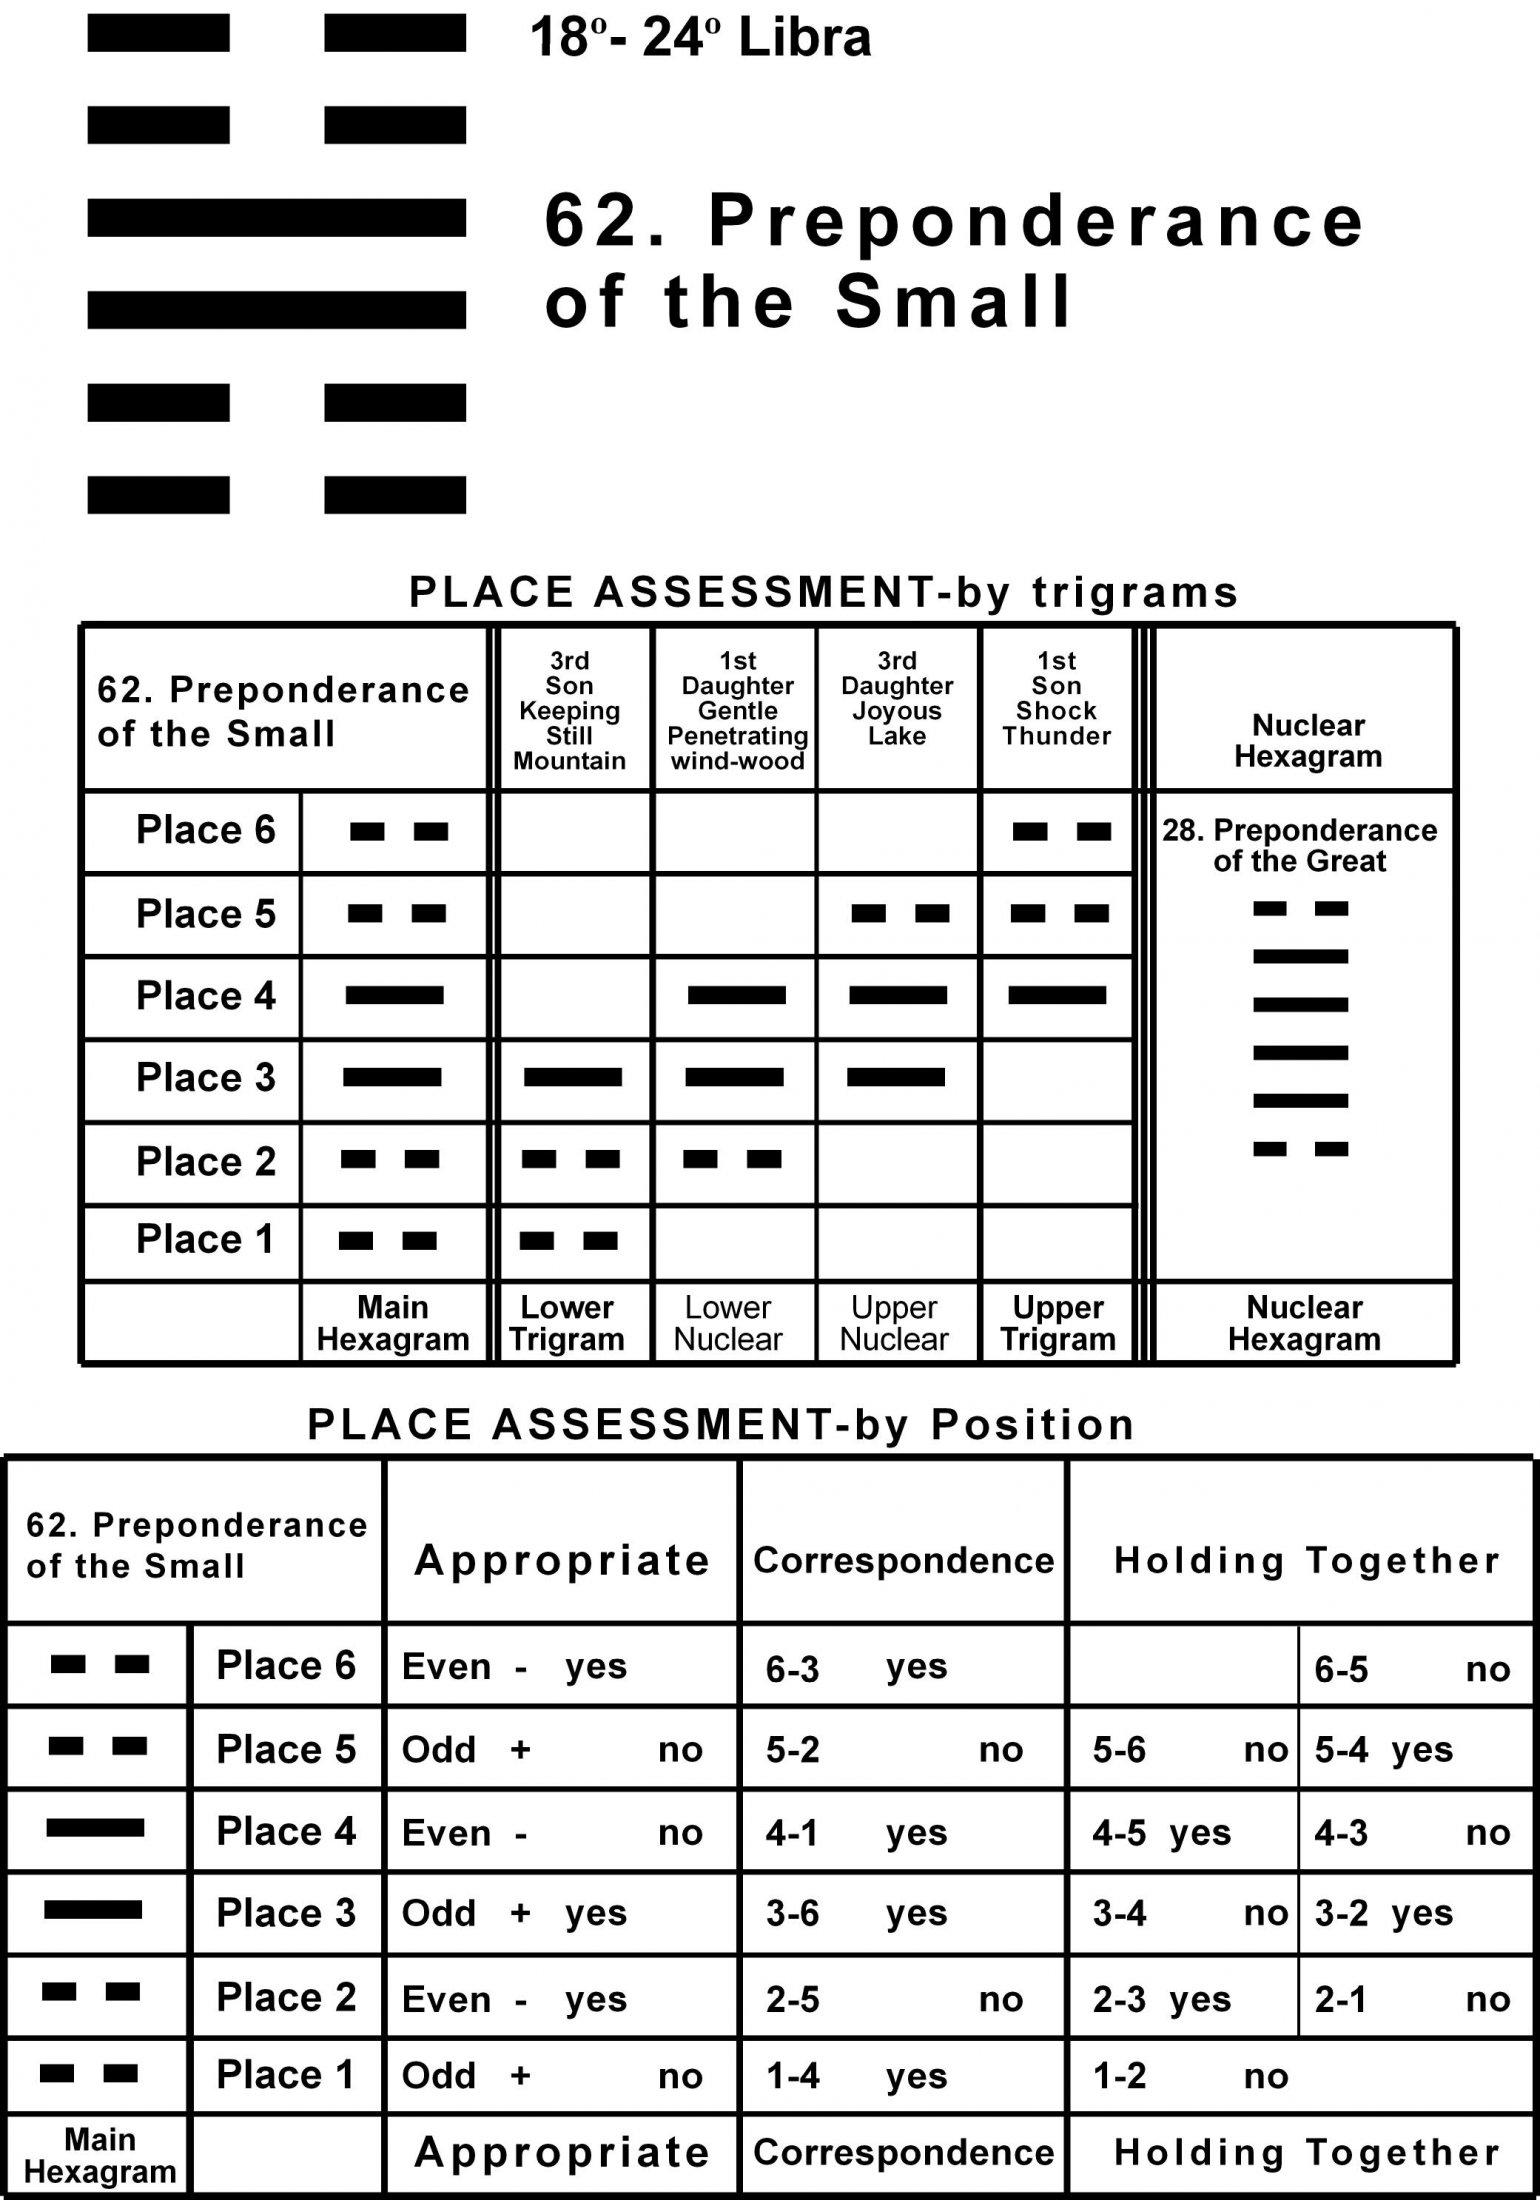 Places-07LI 18-24 Hx-62 Preponderance Small